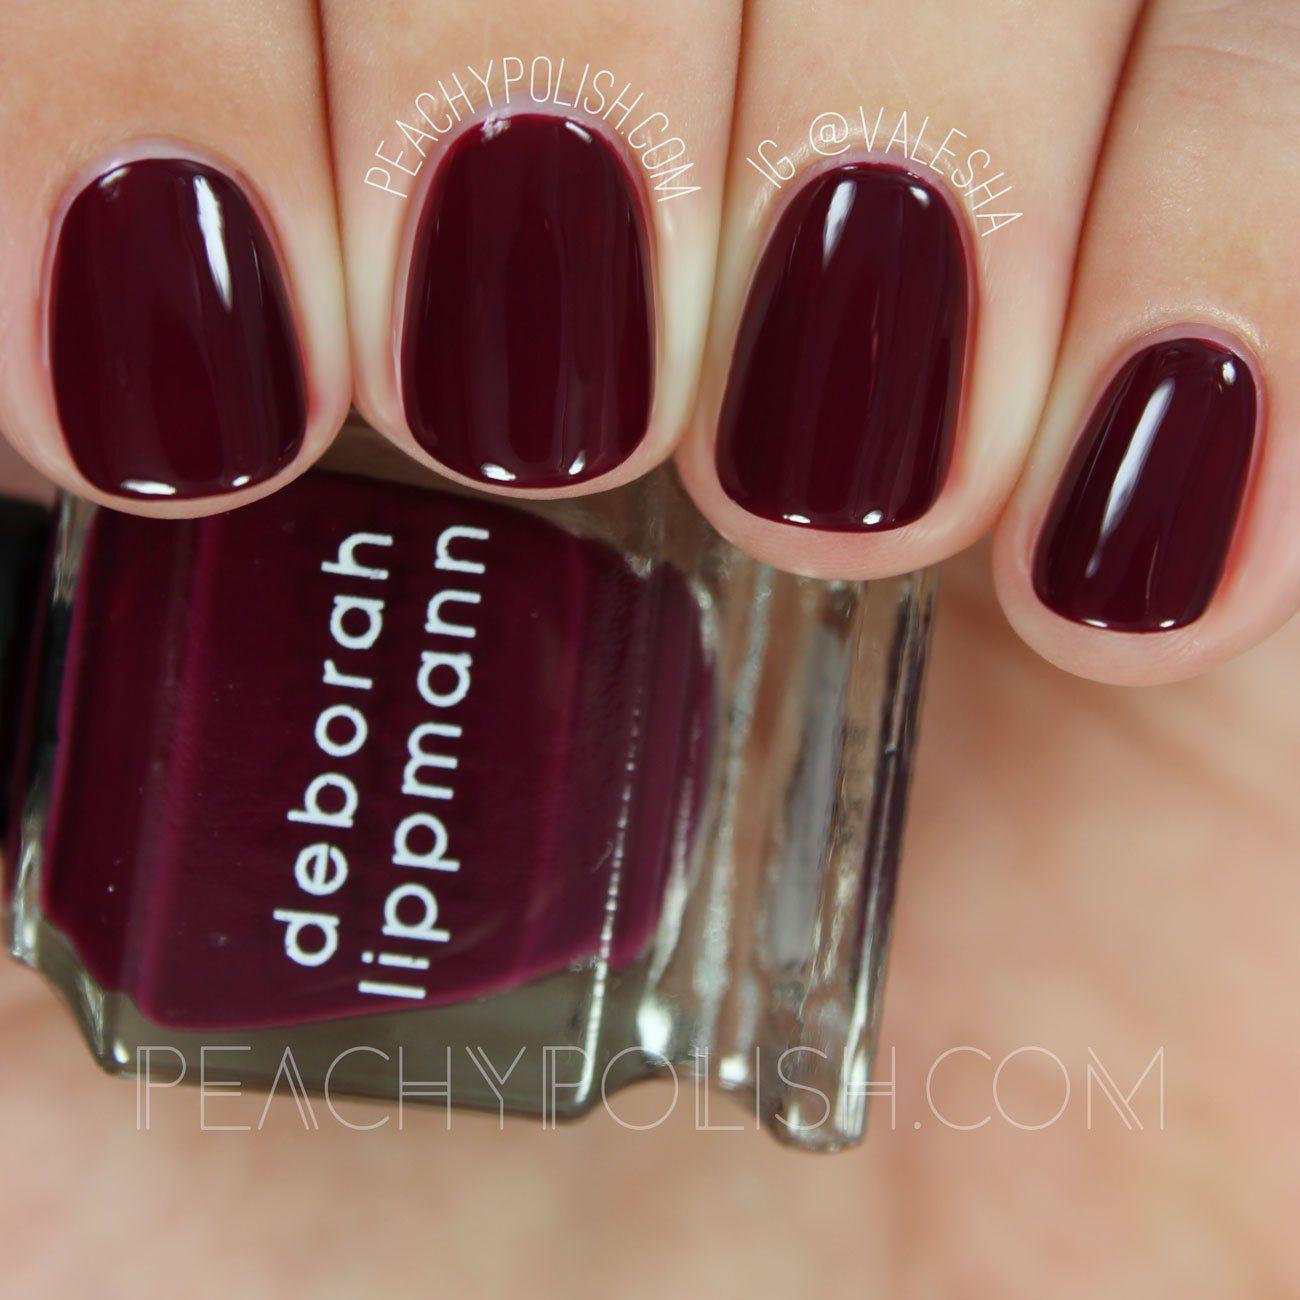 Deborah Lippmann Mulberry\'s Dream | Very Berry Mini Set | Peachy ...